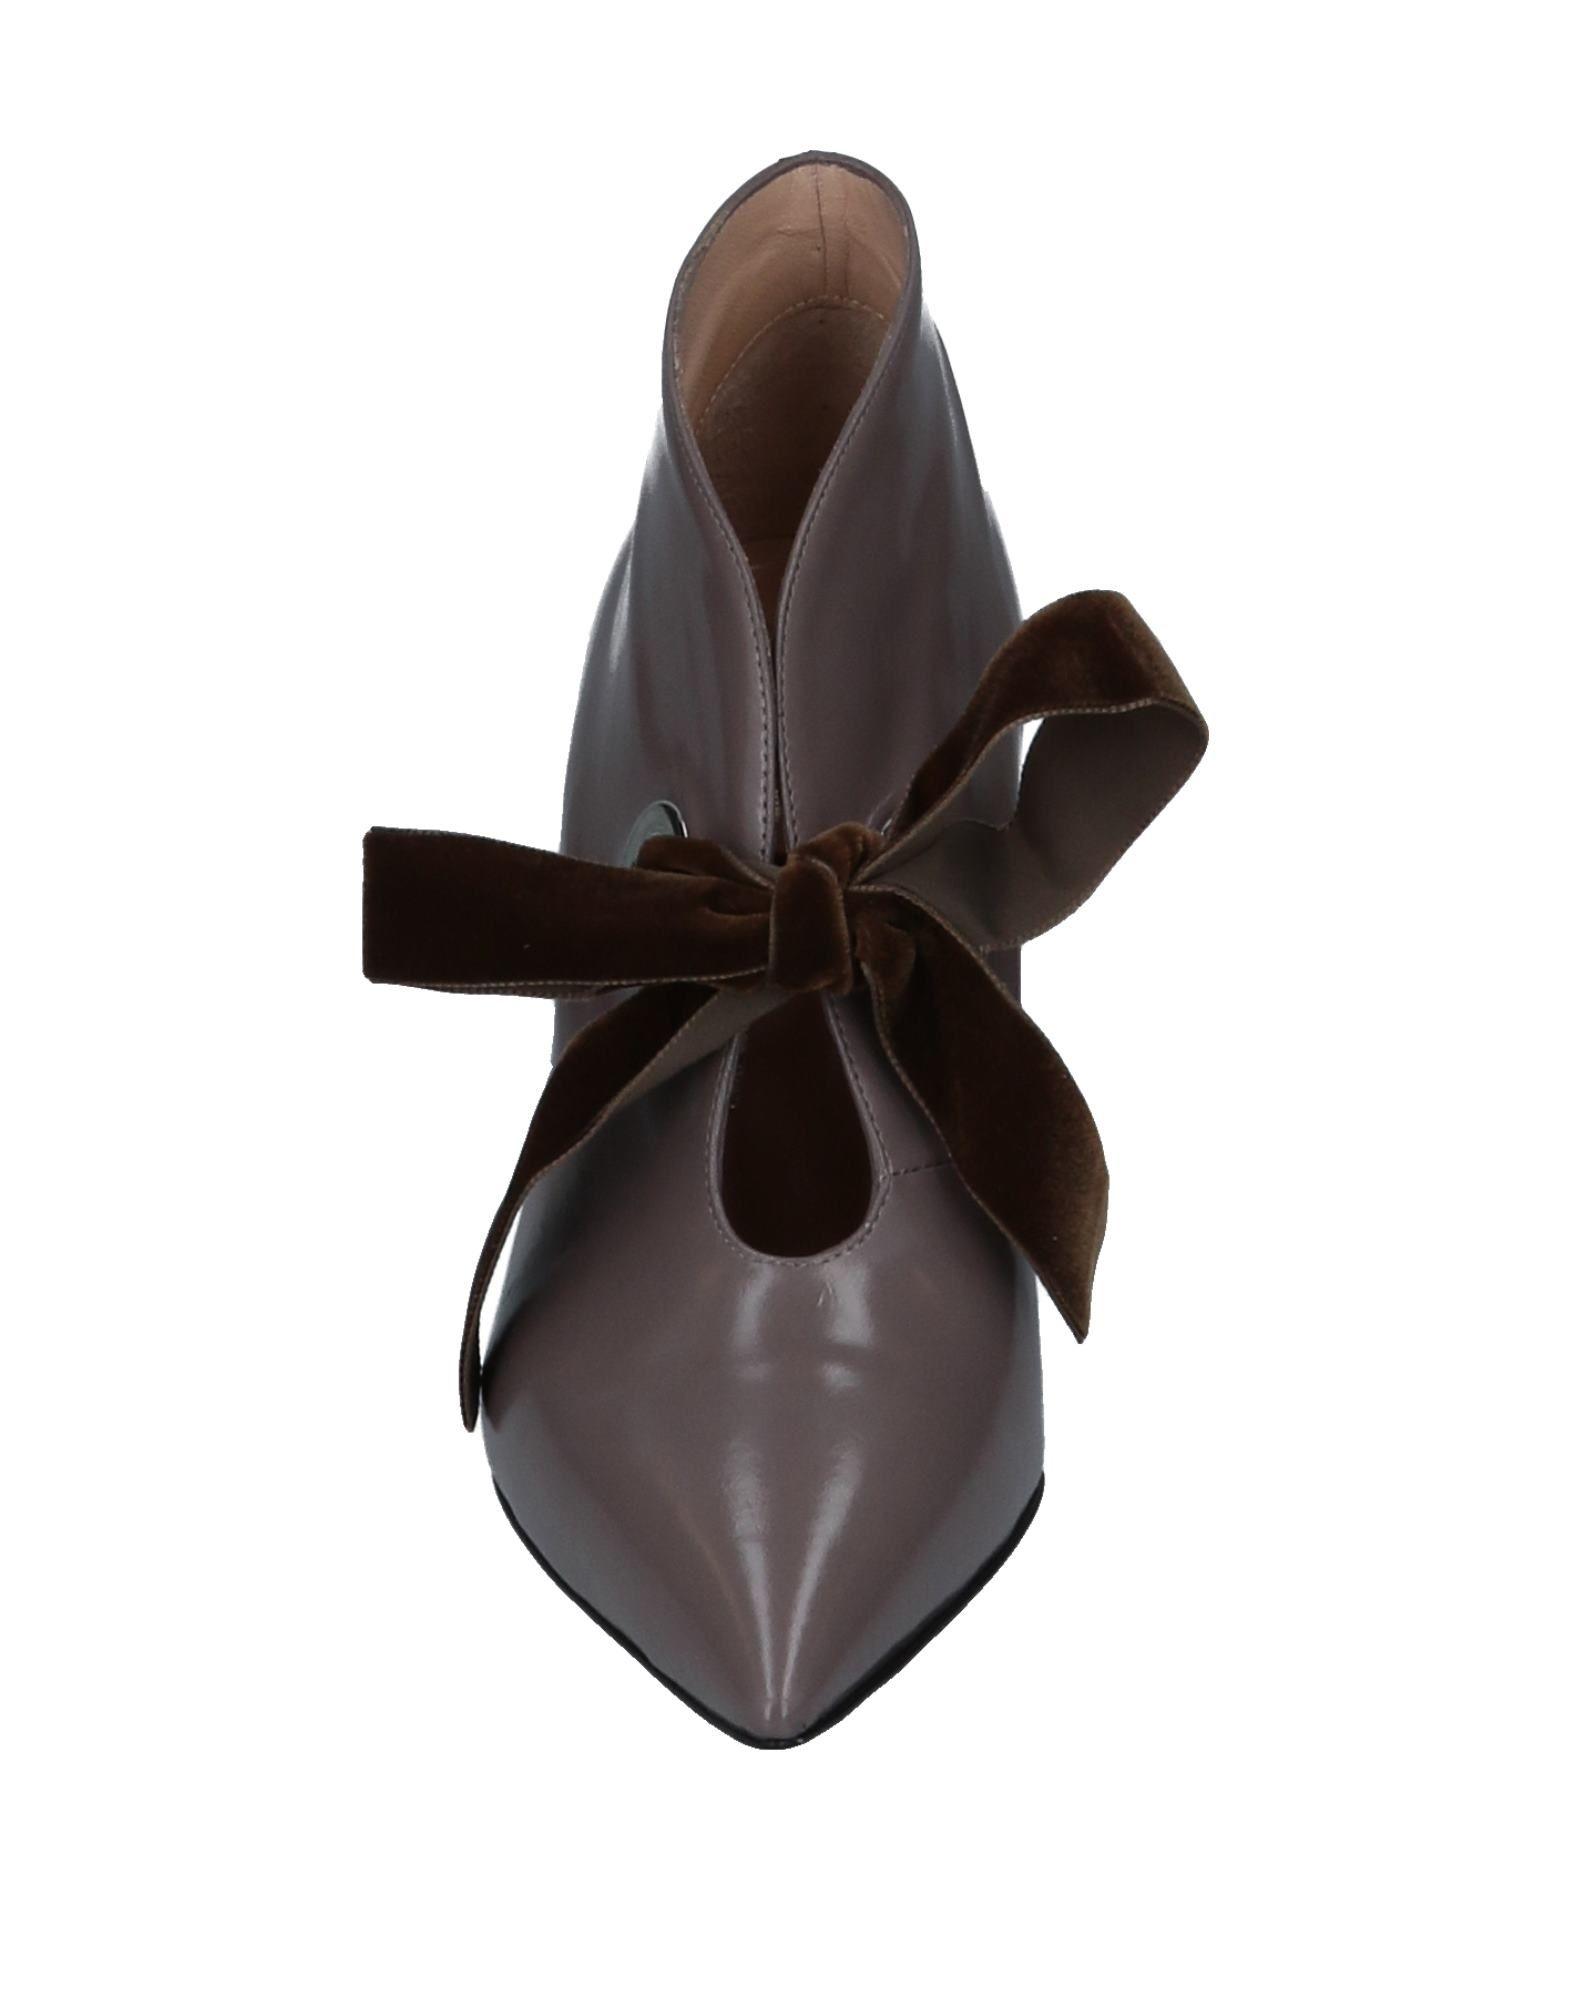 Giancarlo Paoli Stiefelette Damen strapazierfähige  11541437XIGut aussehende strapazierfähige Damen Schuhe dad2c2